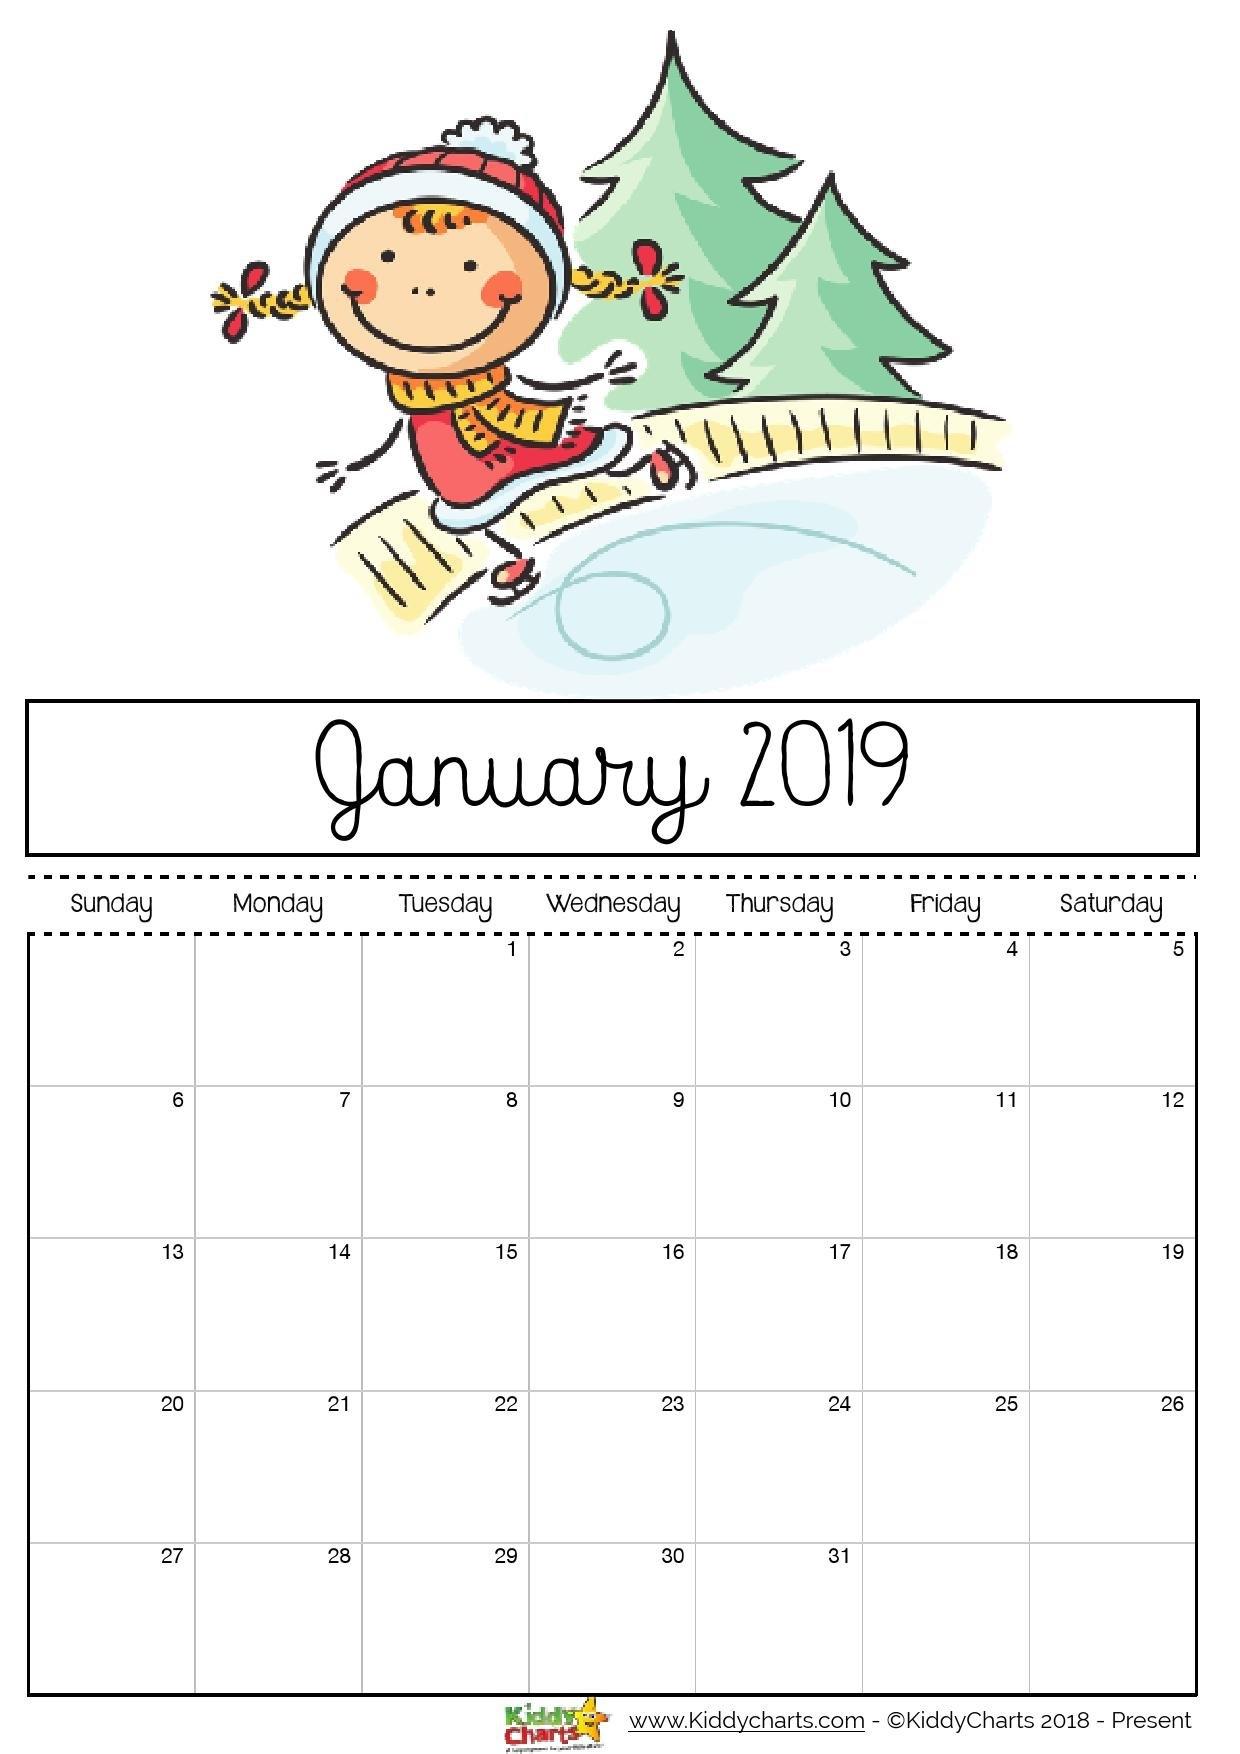 2019 Free Printable Calendars - Lolly Jane Calendar 2019 Printable Free